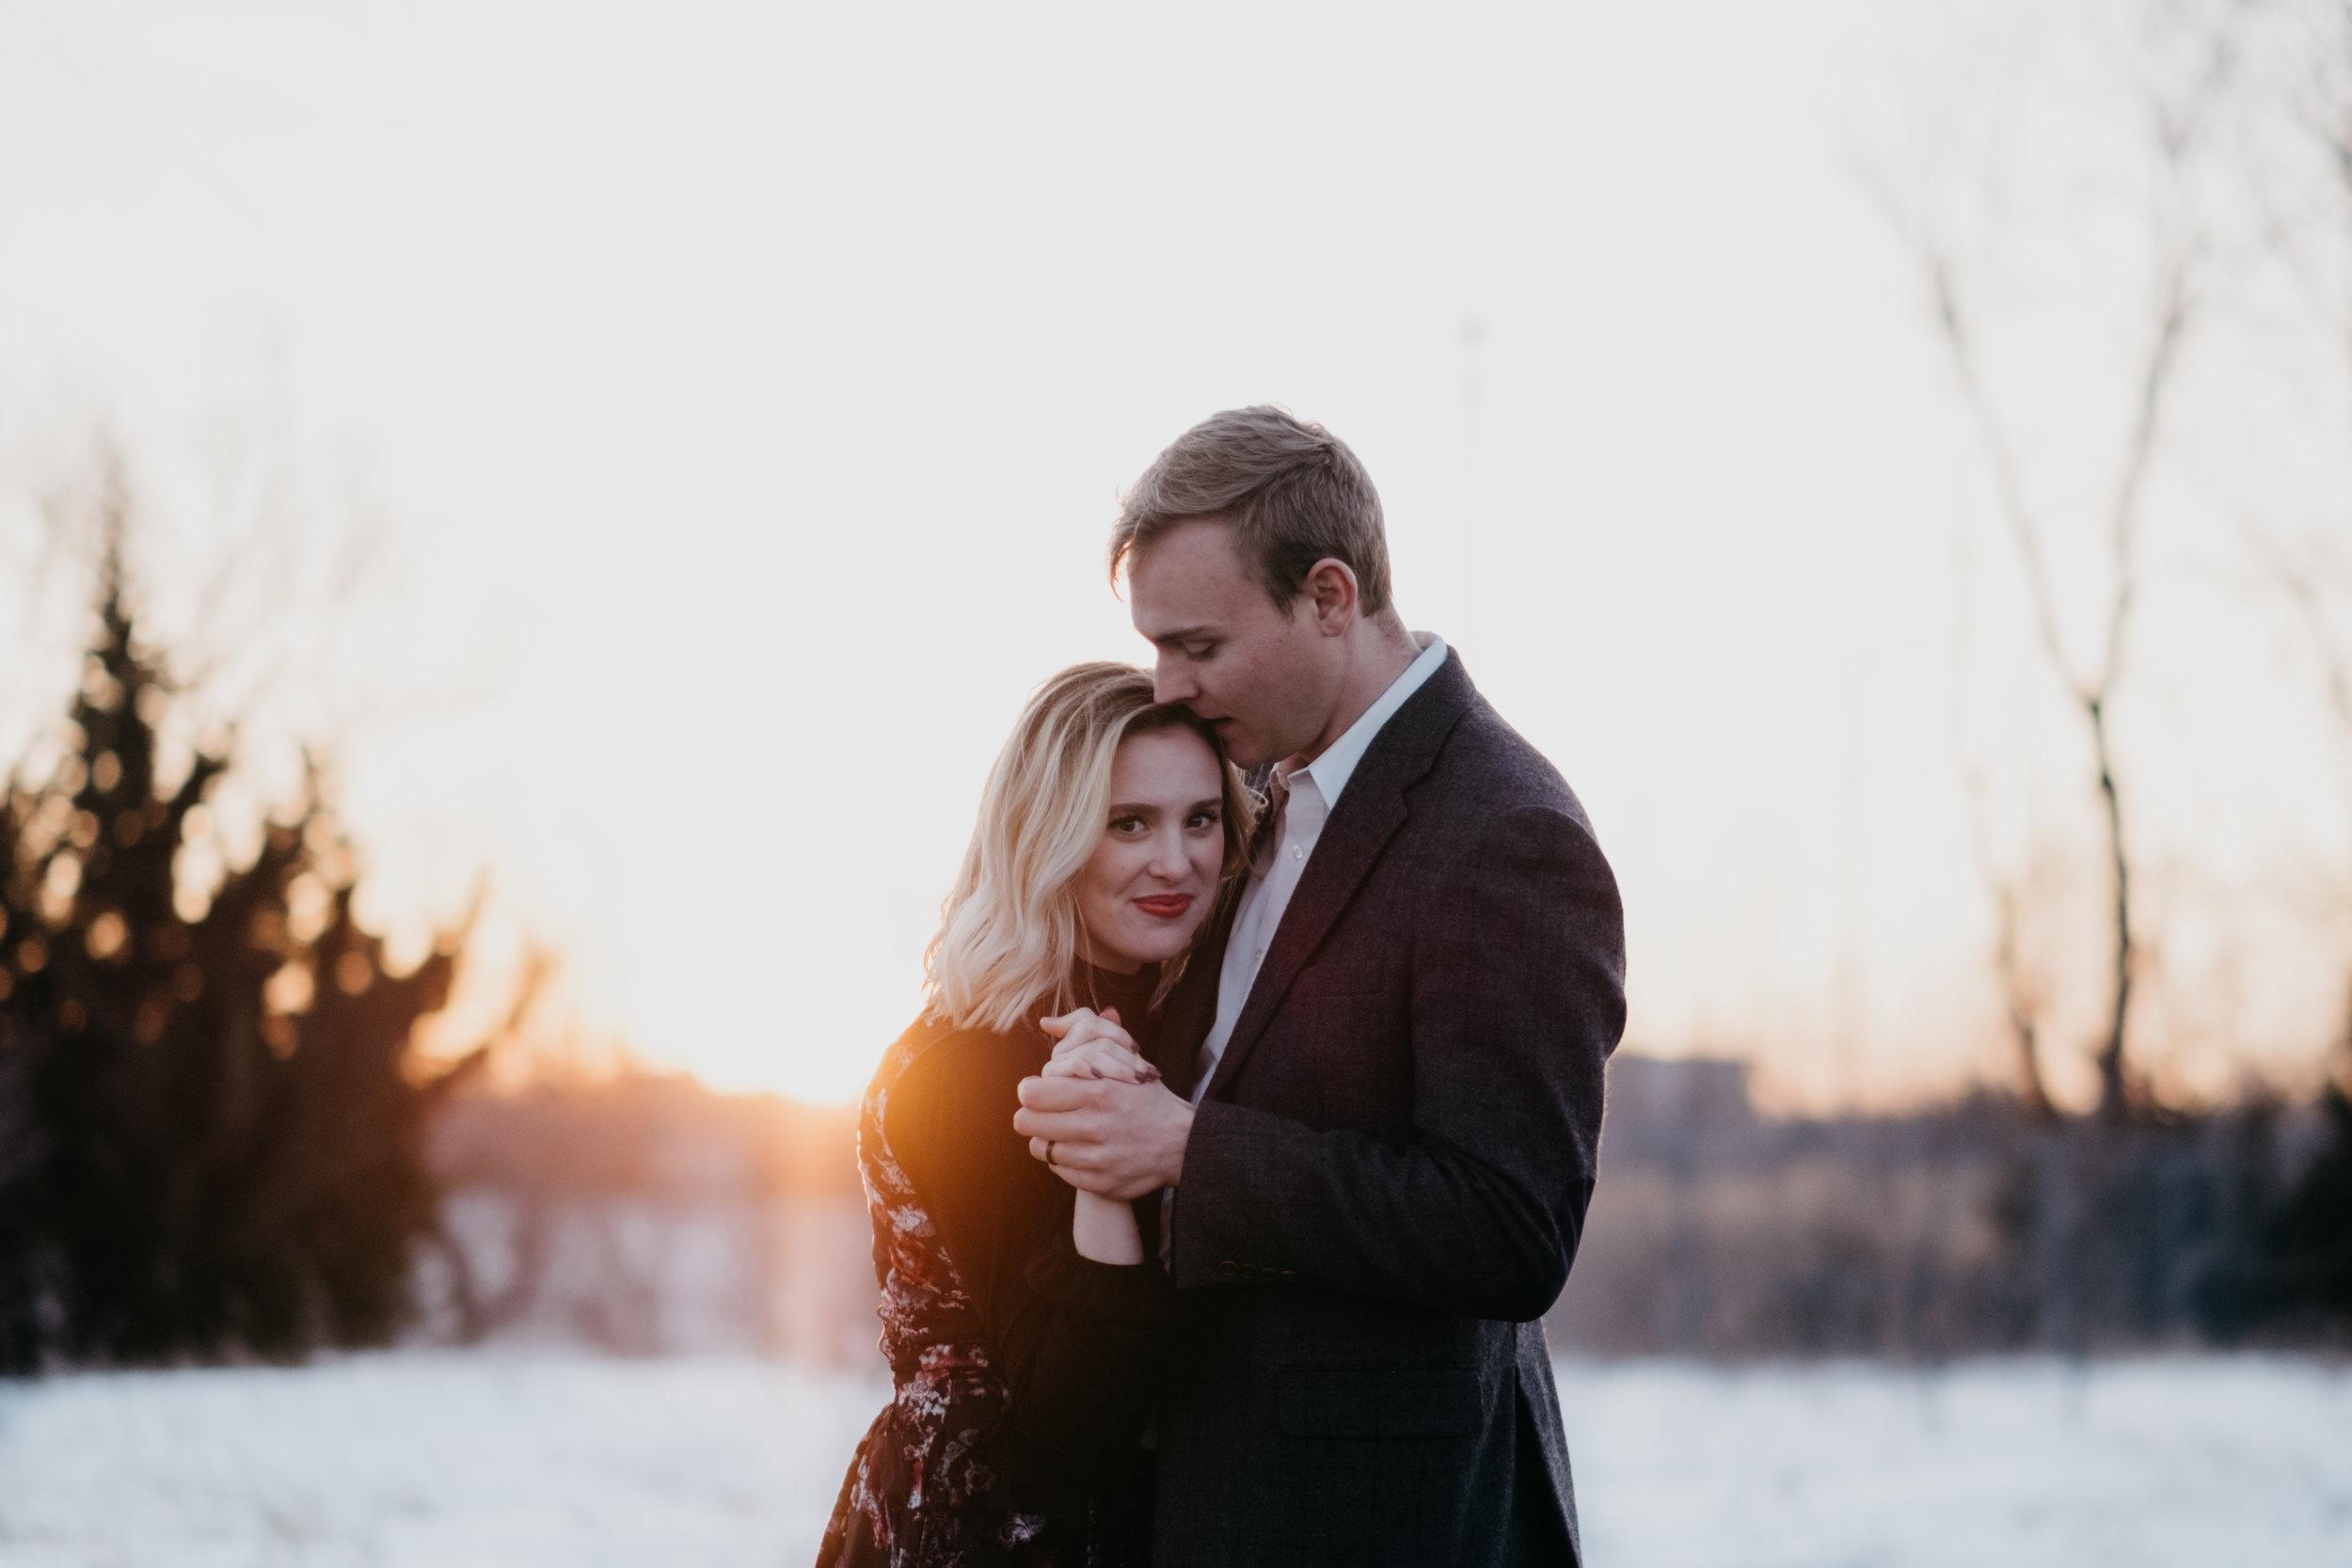 Talia + Brendan | Engagement Photography | Sioux Falls, South Dakota Photographer-146.jpg